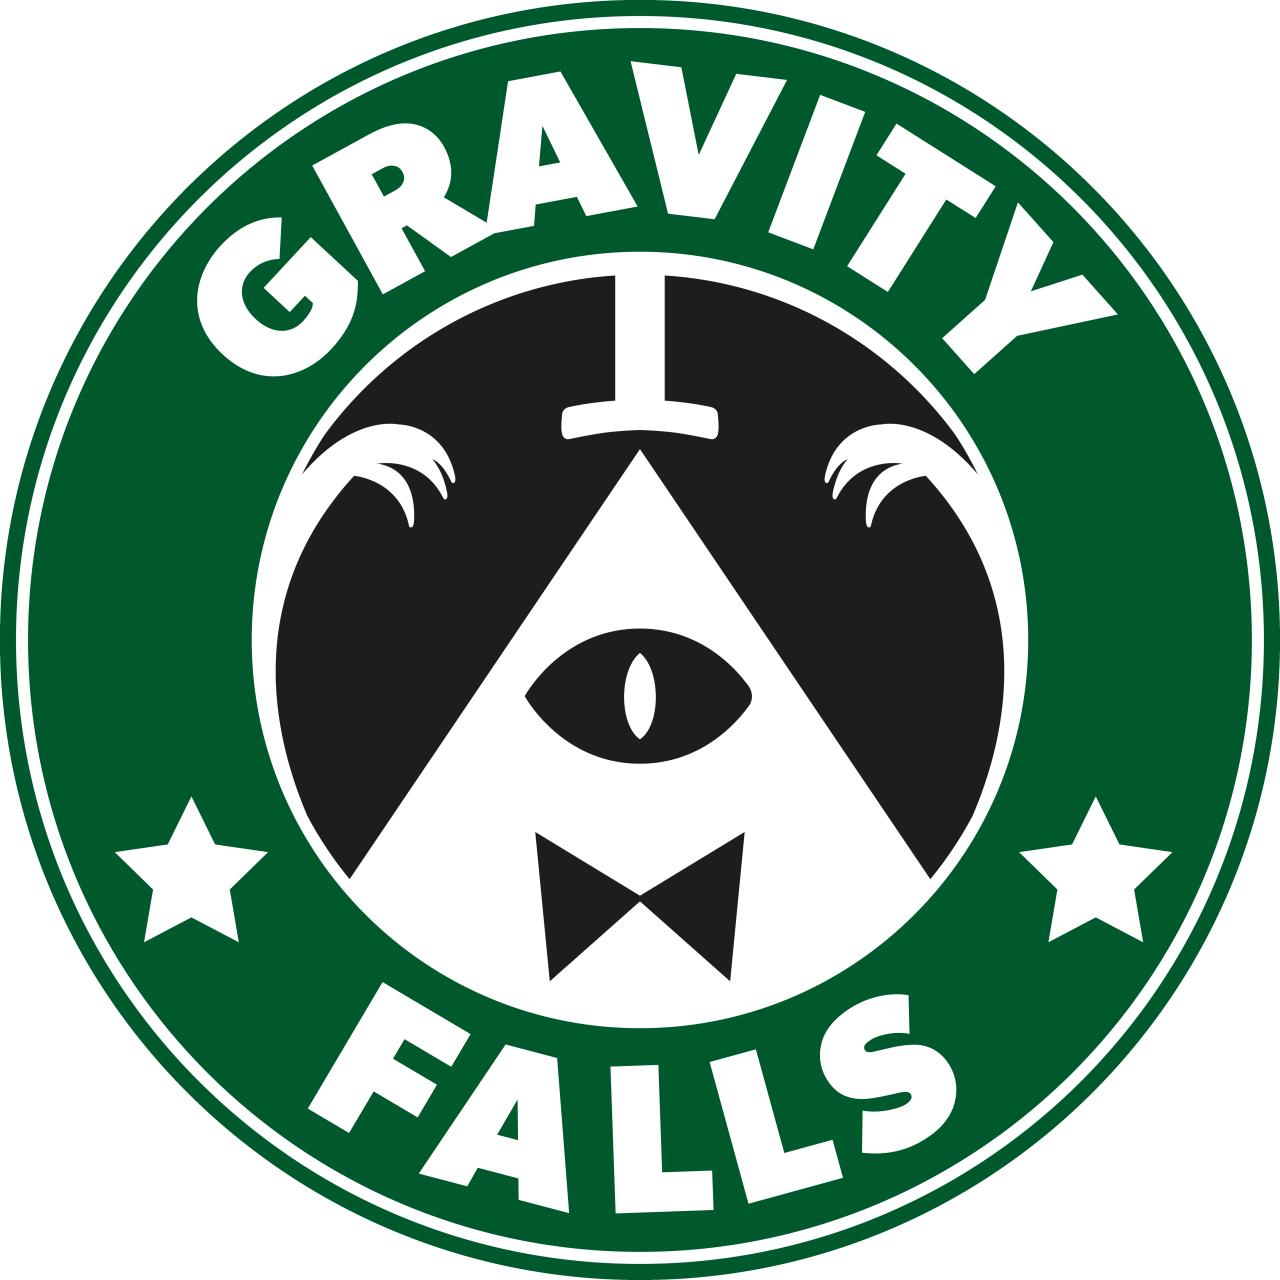 Pin De Lynn Em Gravity Falls Gravity Falls Desenhos Diabolicos Desenhos Gravity Falls